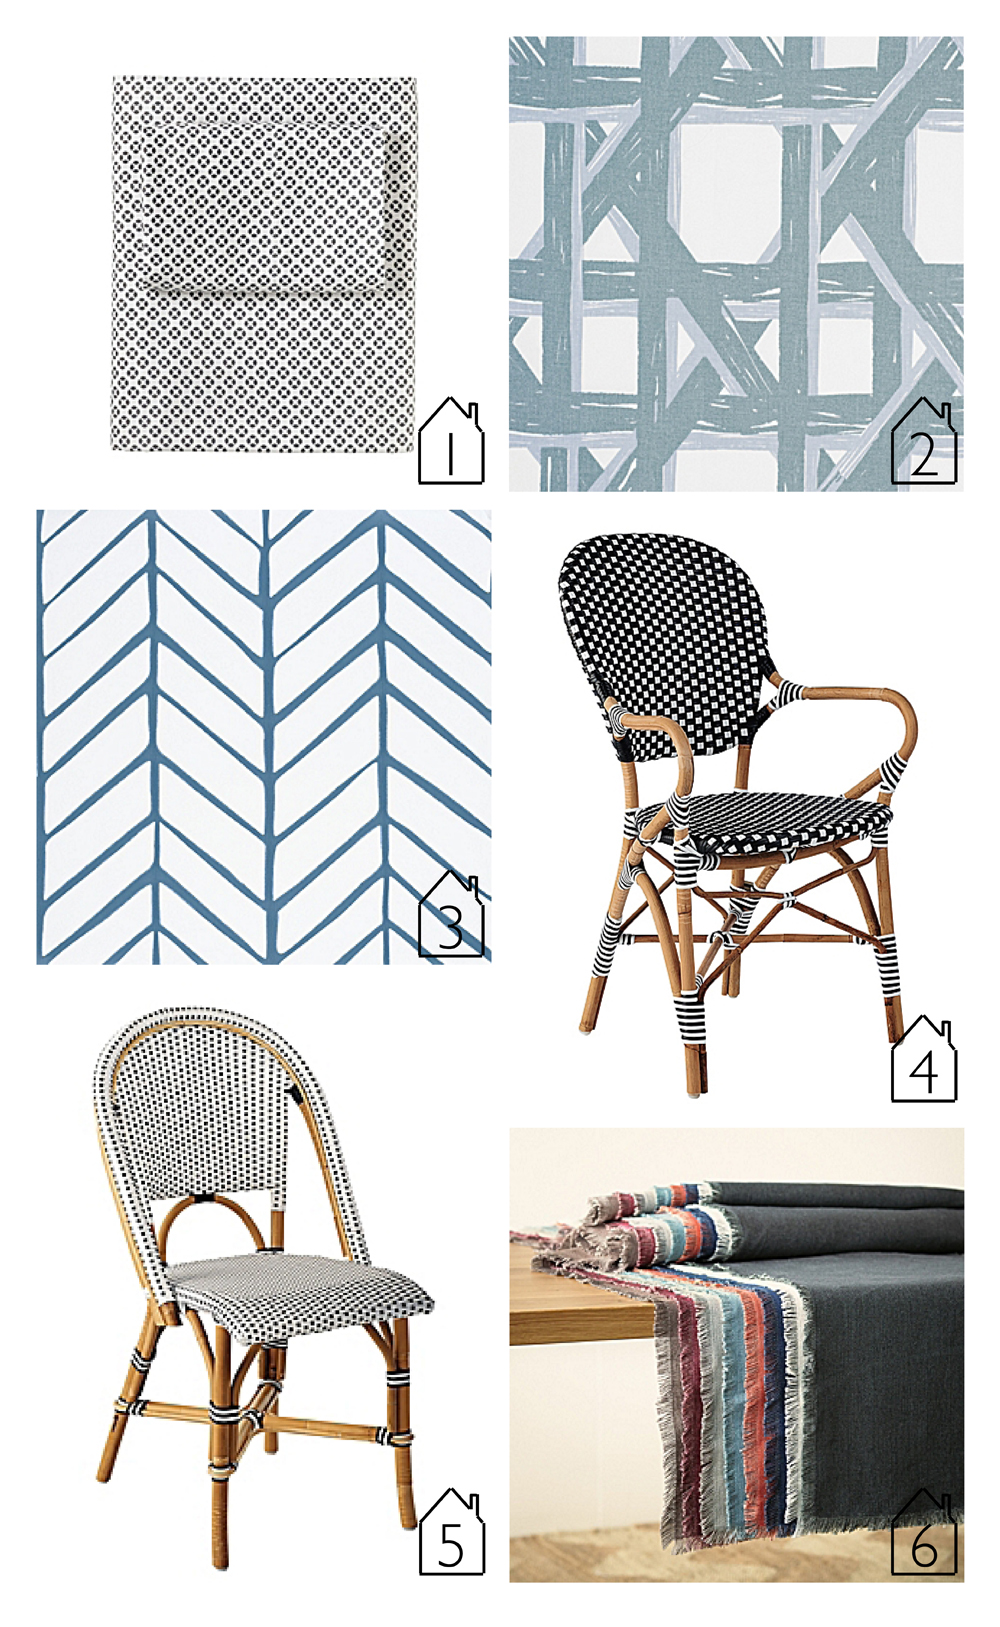 1. Cut Circle Sheet Set - Pewter  2.   Havana Fabric - Celadon  3.  Feather Wallpaper - Denim  4.  Riviera Armchair - Black  5.  Riviera Side Chair - Black  6.  Capri Table Linens